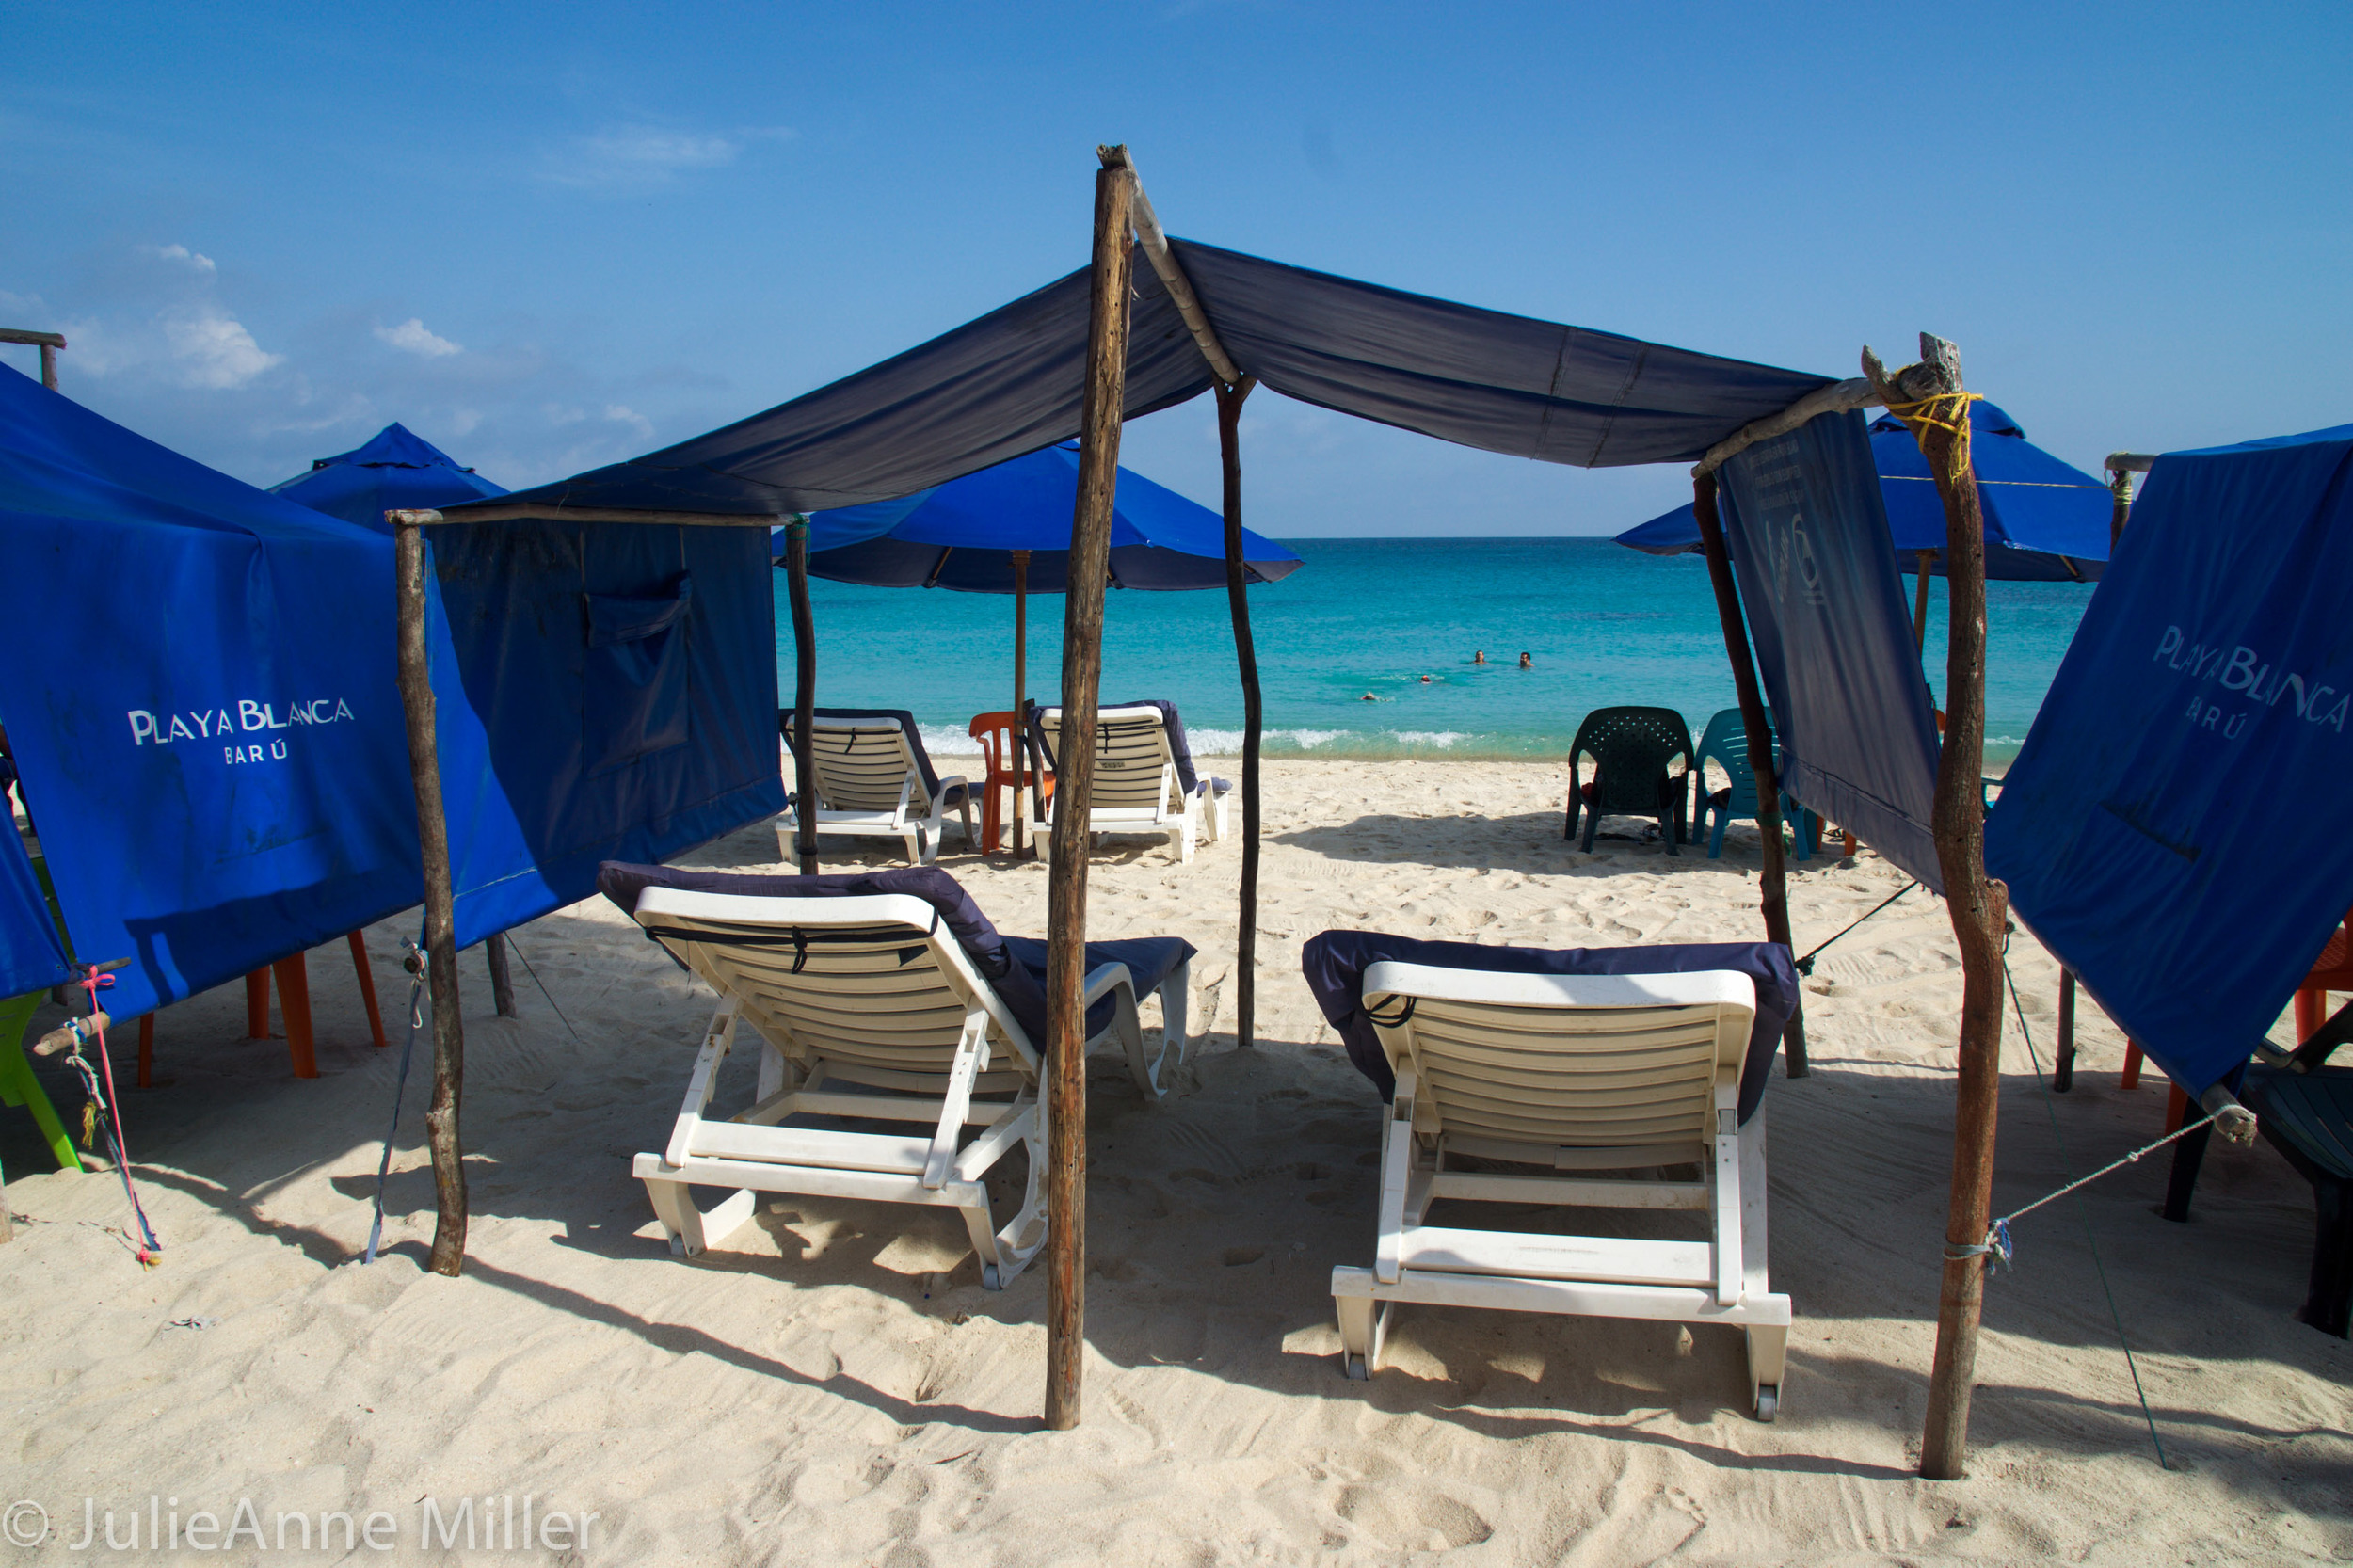 playa blanca tent shade.jpg